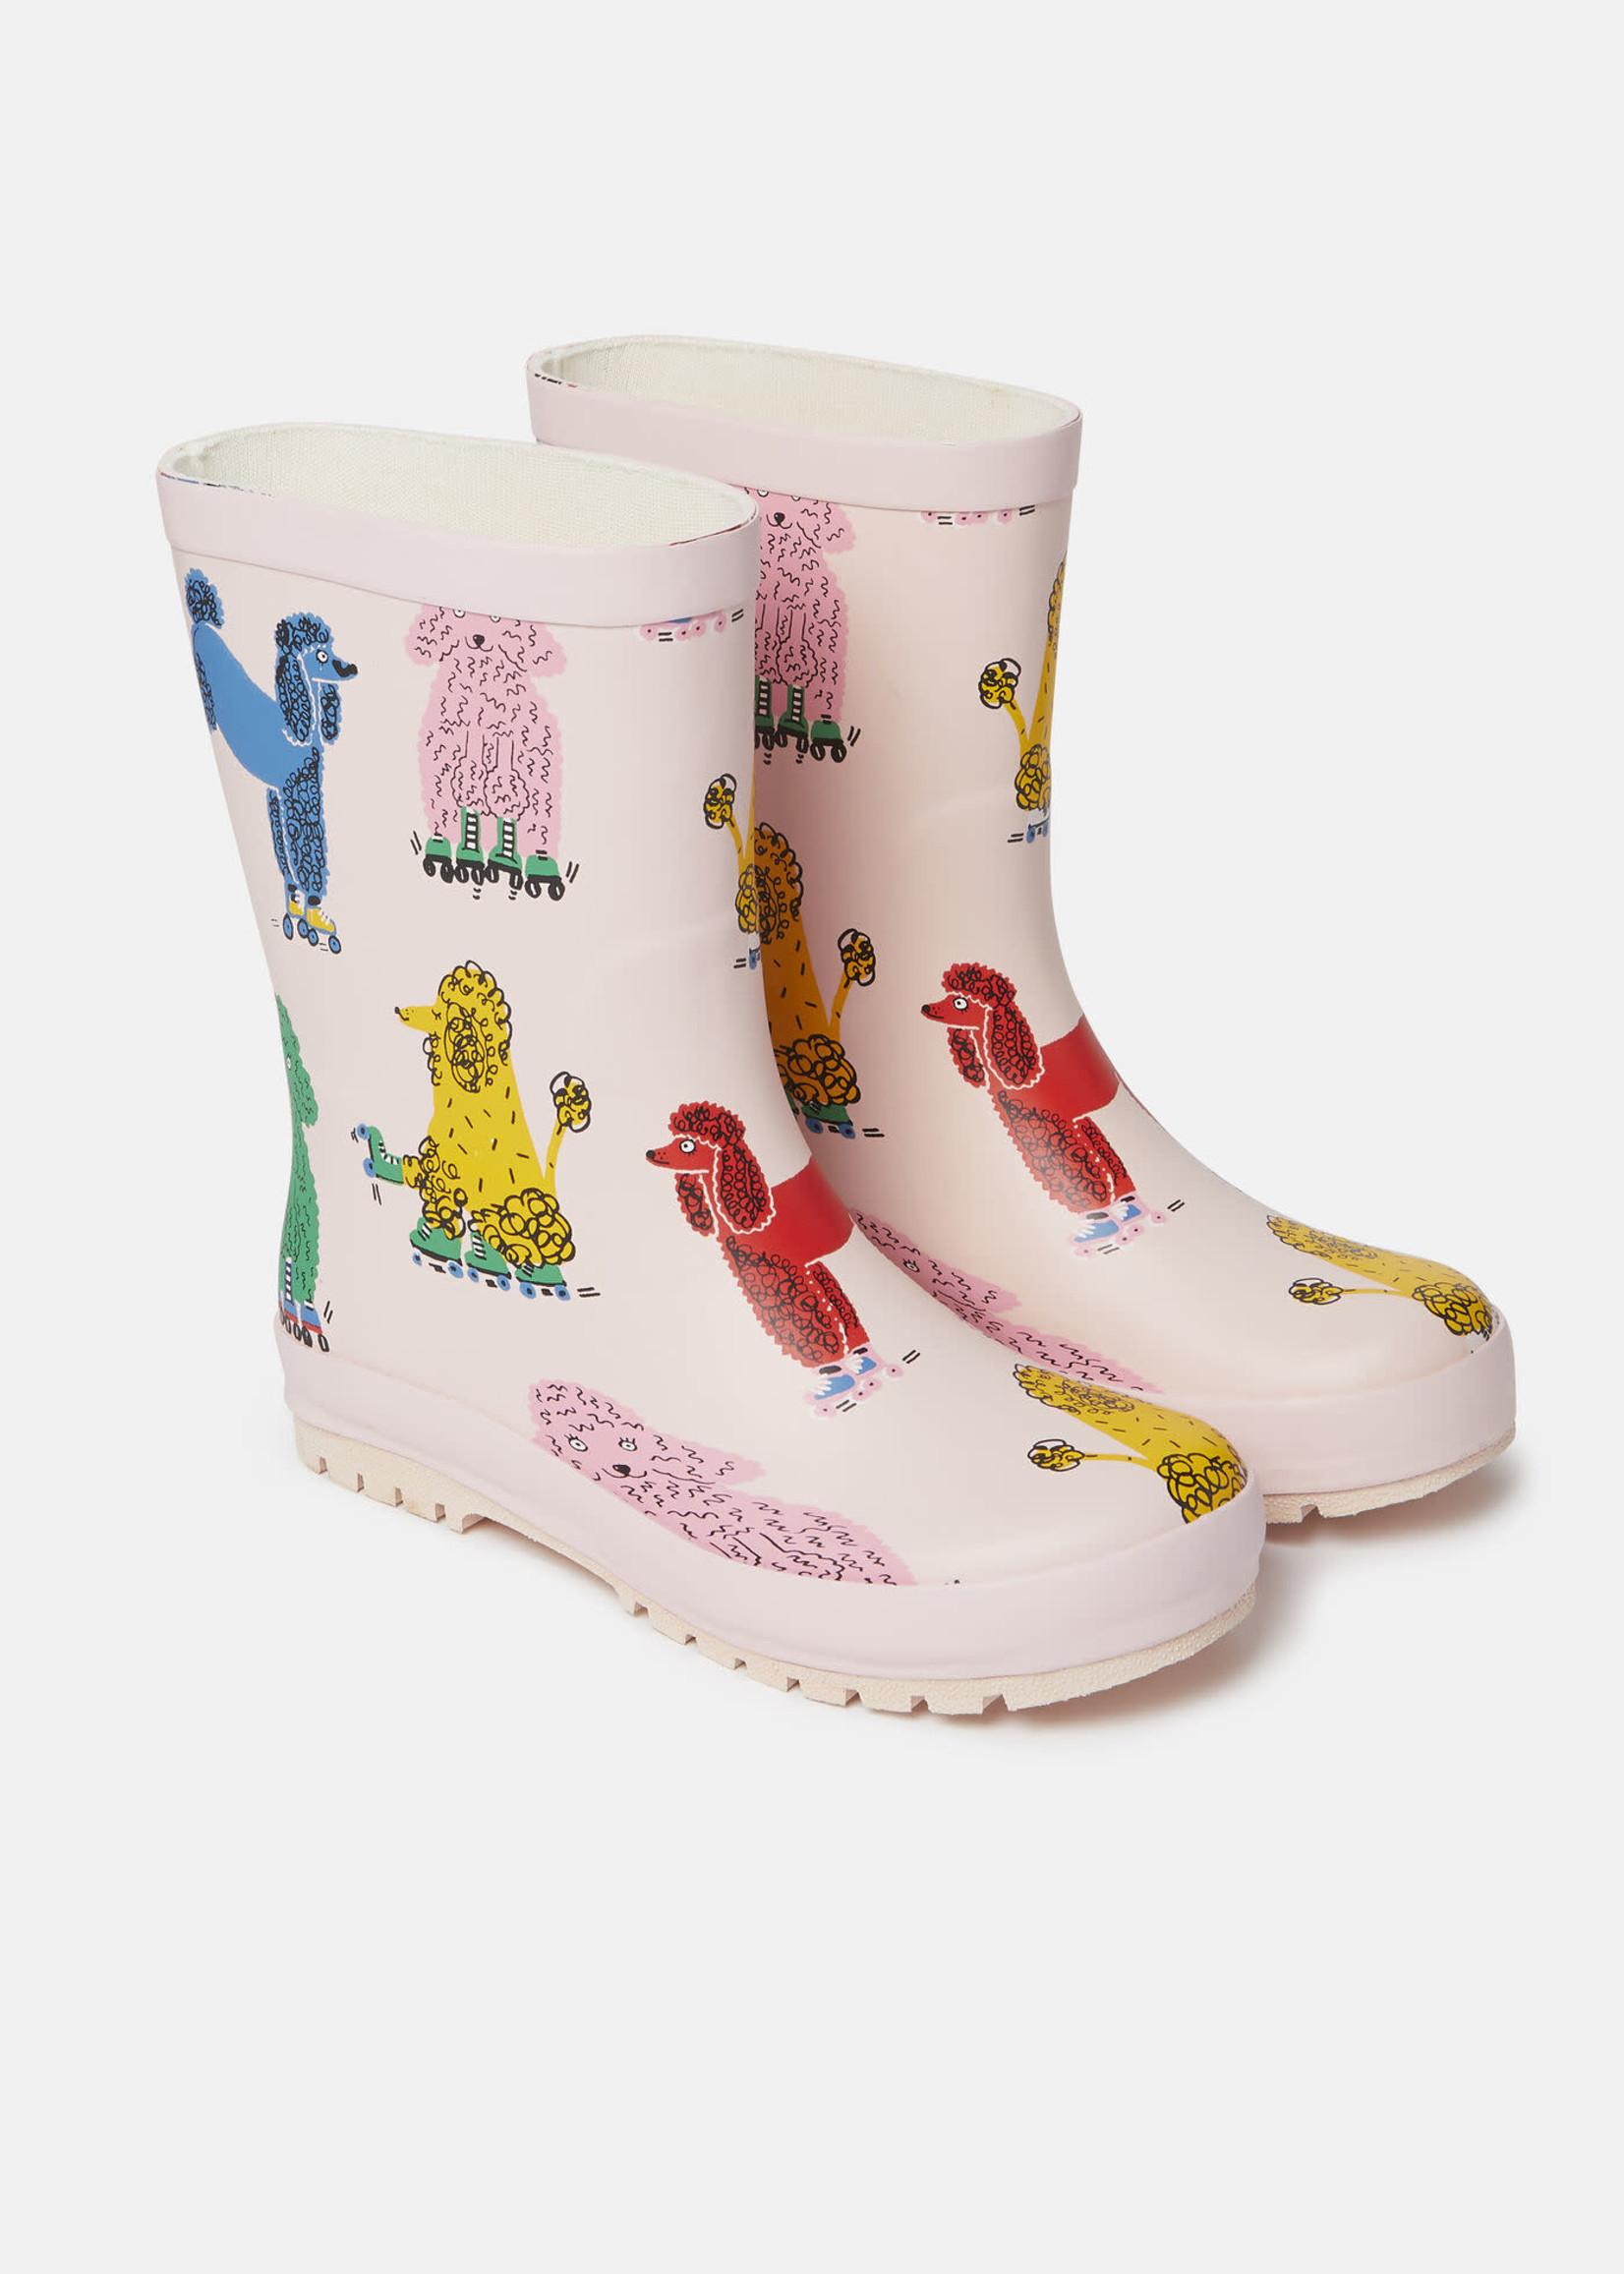 Stella McCartney Stella Mccartney-AW21 603400 Doodle Poodles Waterproof Rainboots